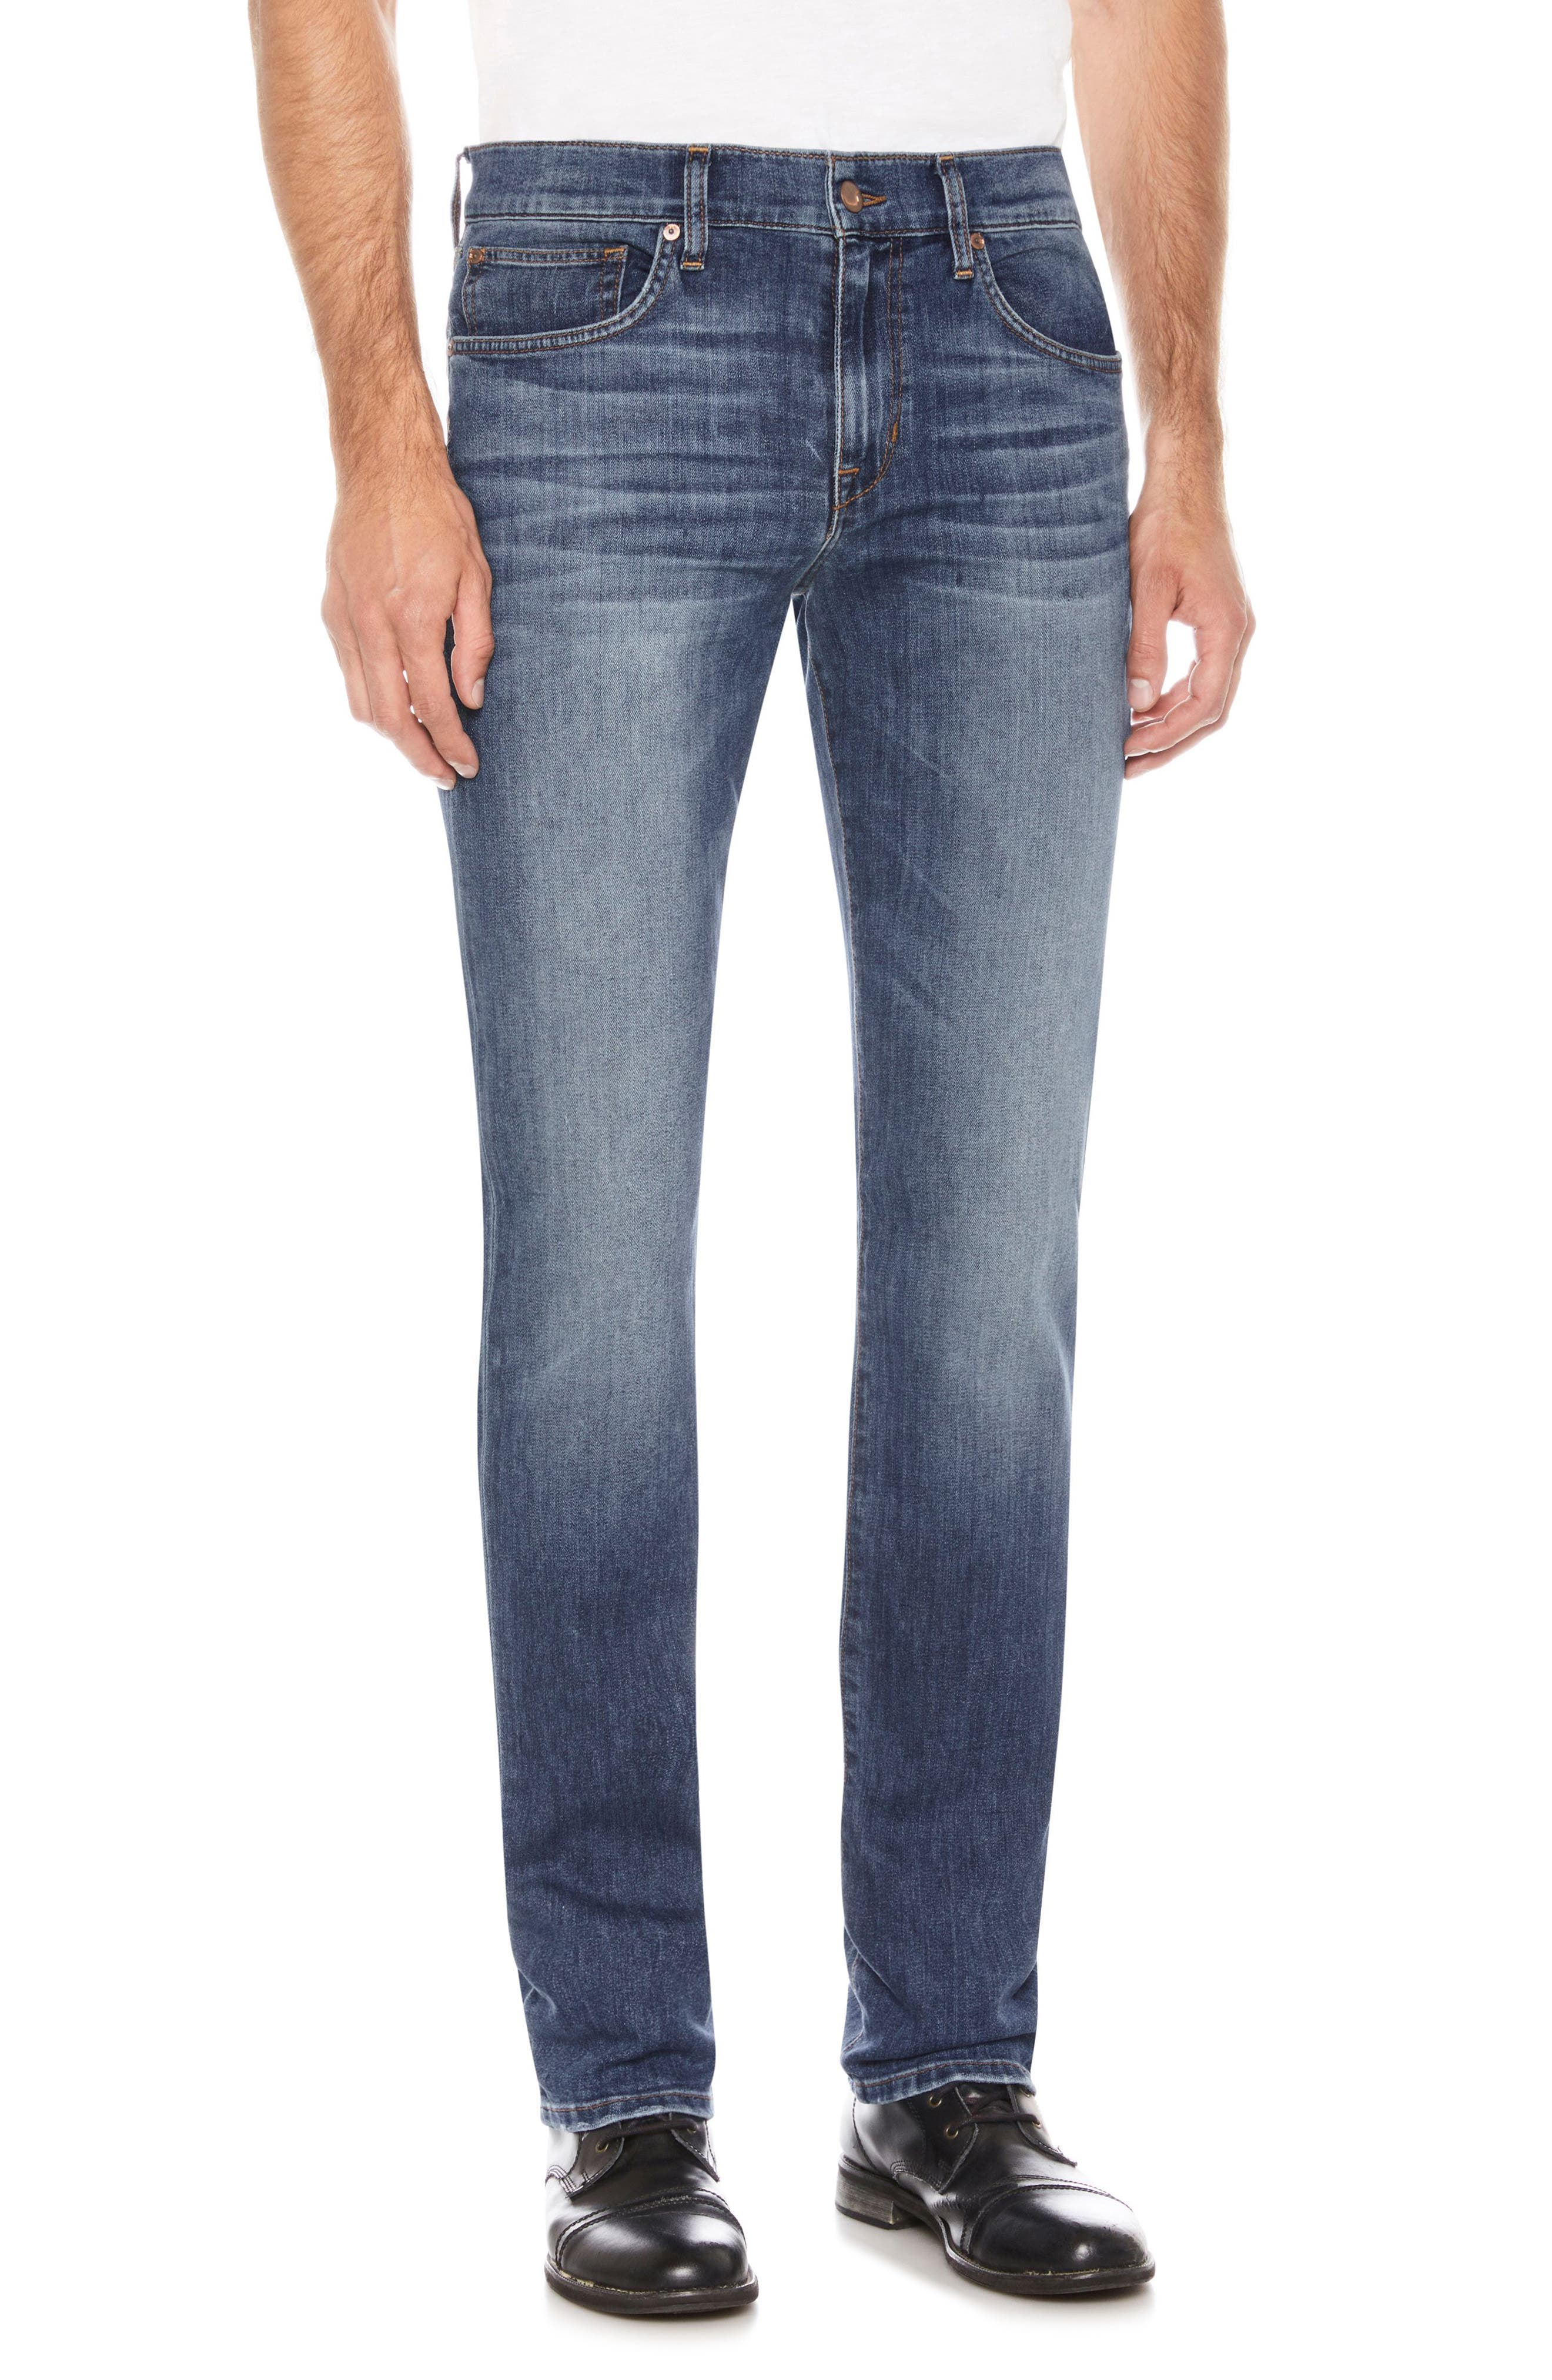 Brixton Slim Straight Leg Jeans,                         Main,                         color, 410